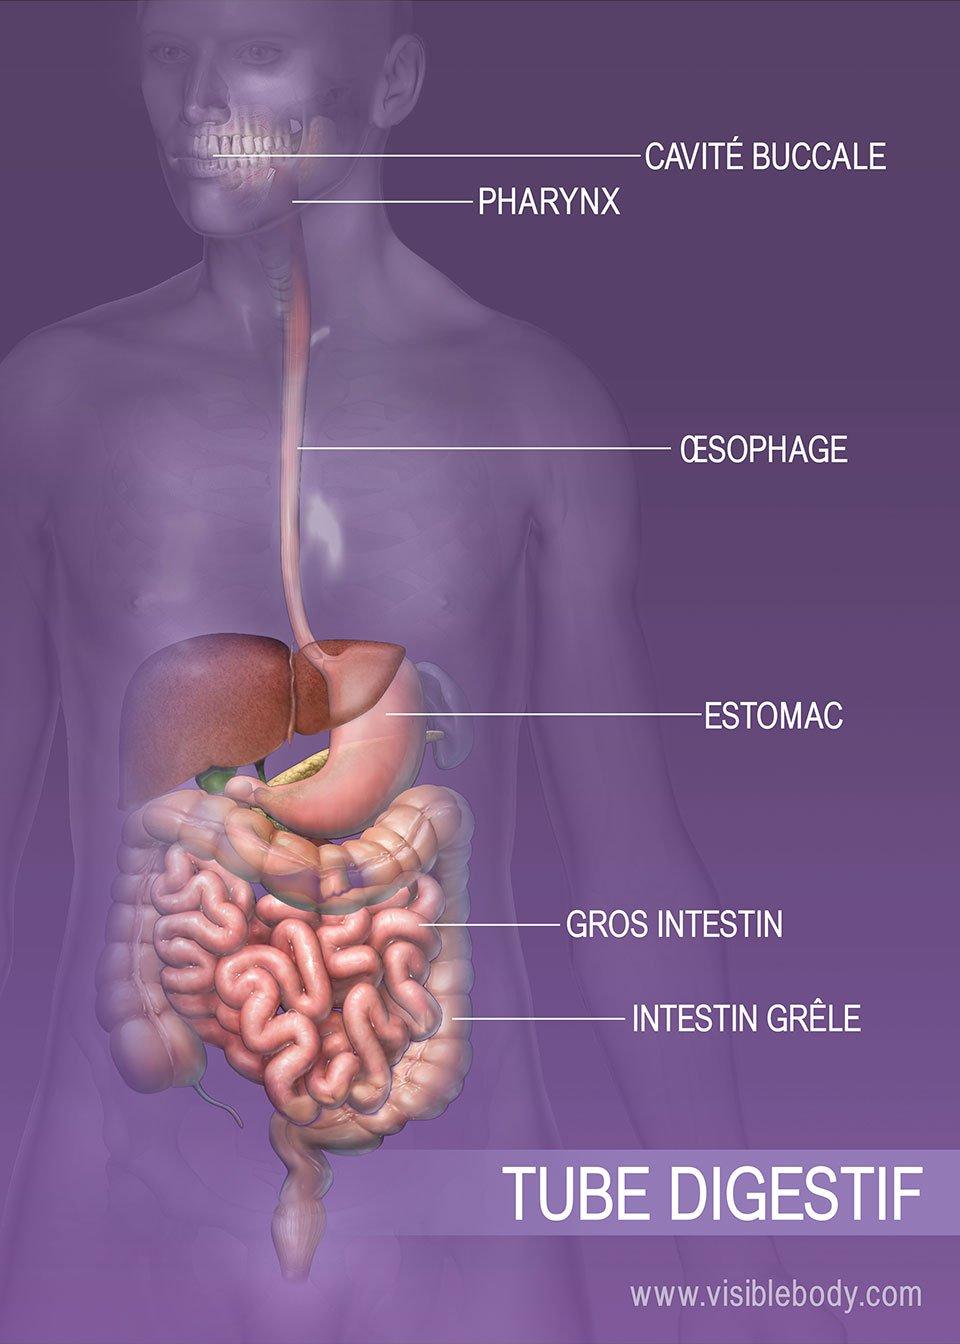 Aperçu du système digestif